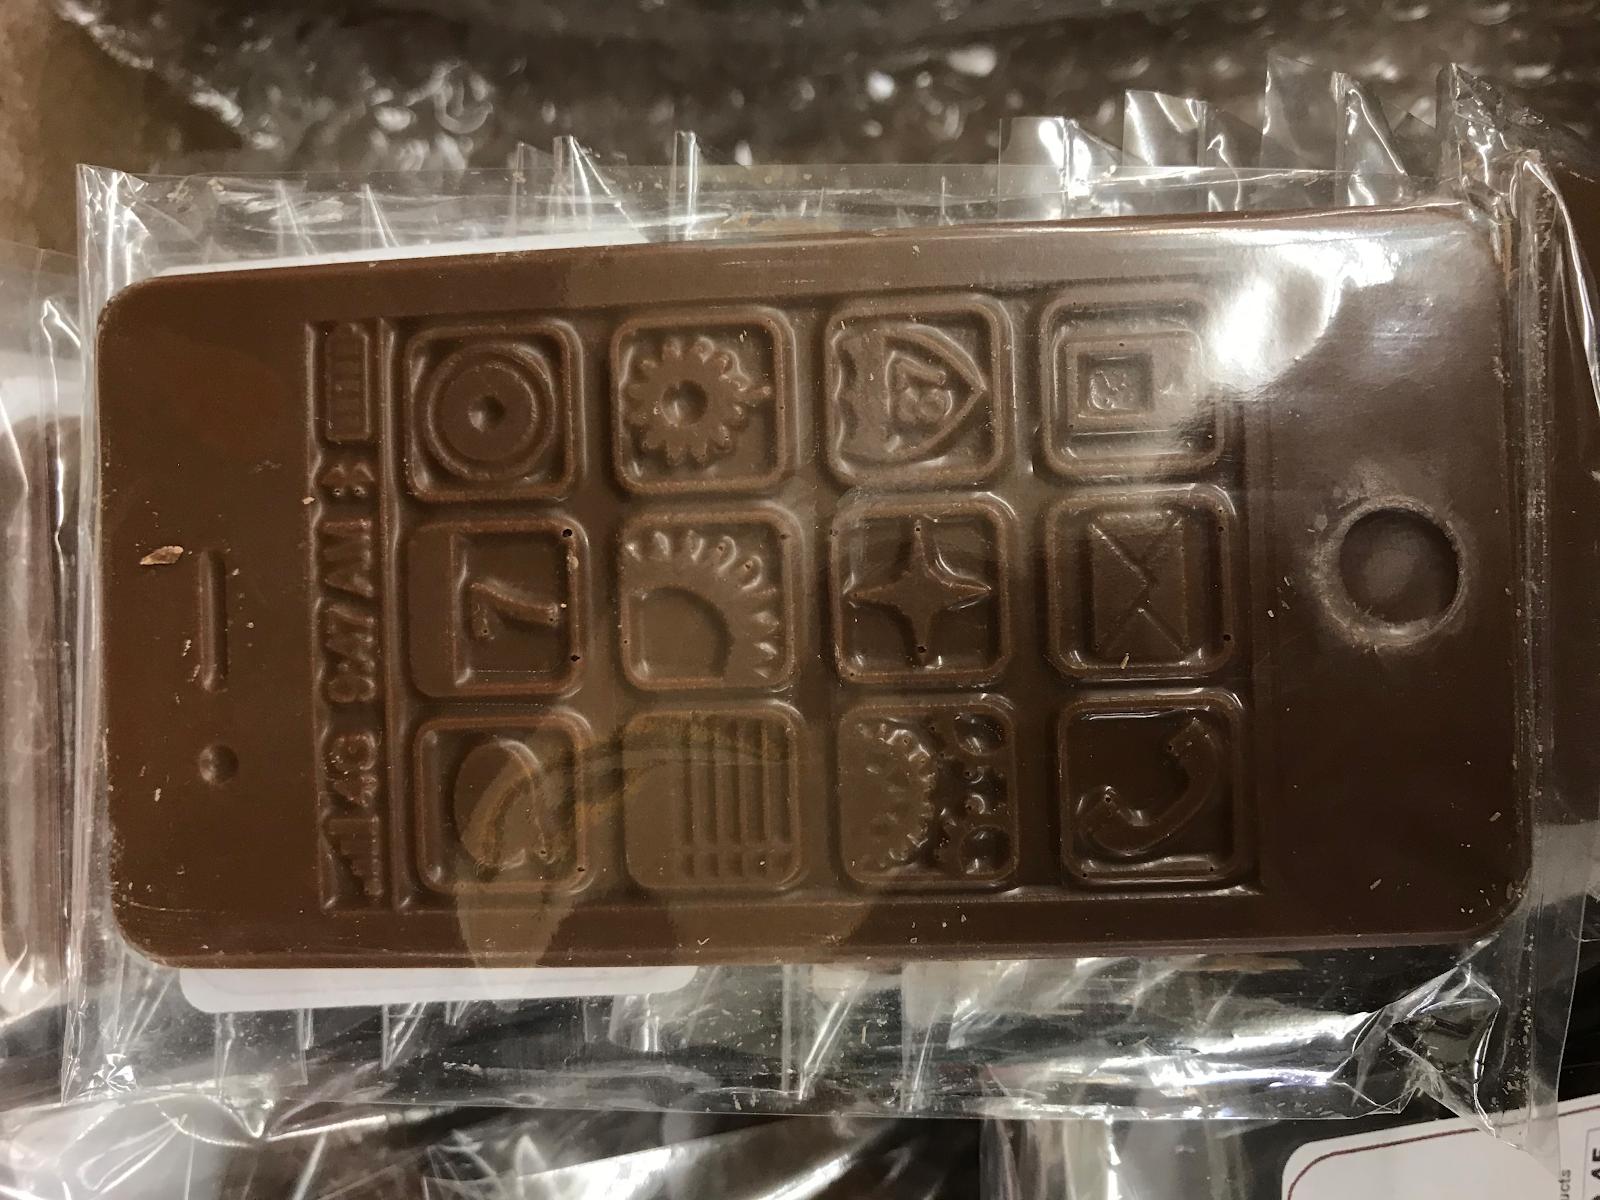 Chocolate iphone